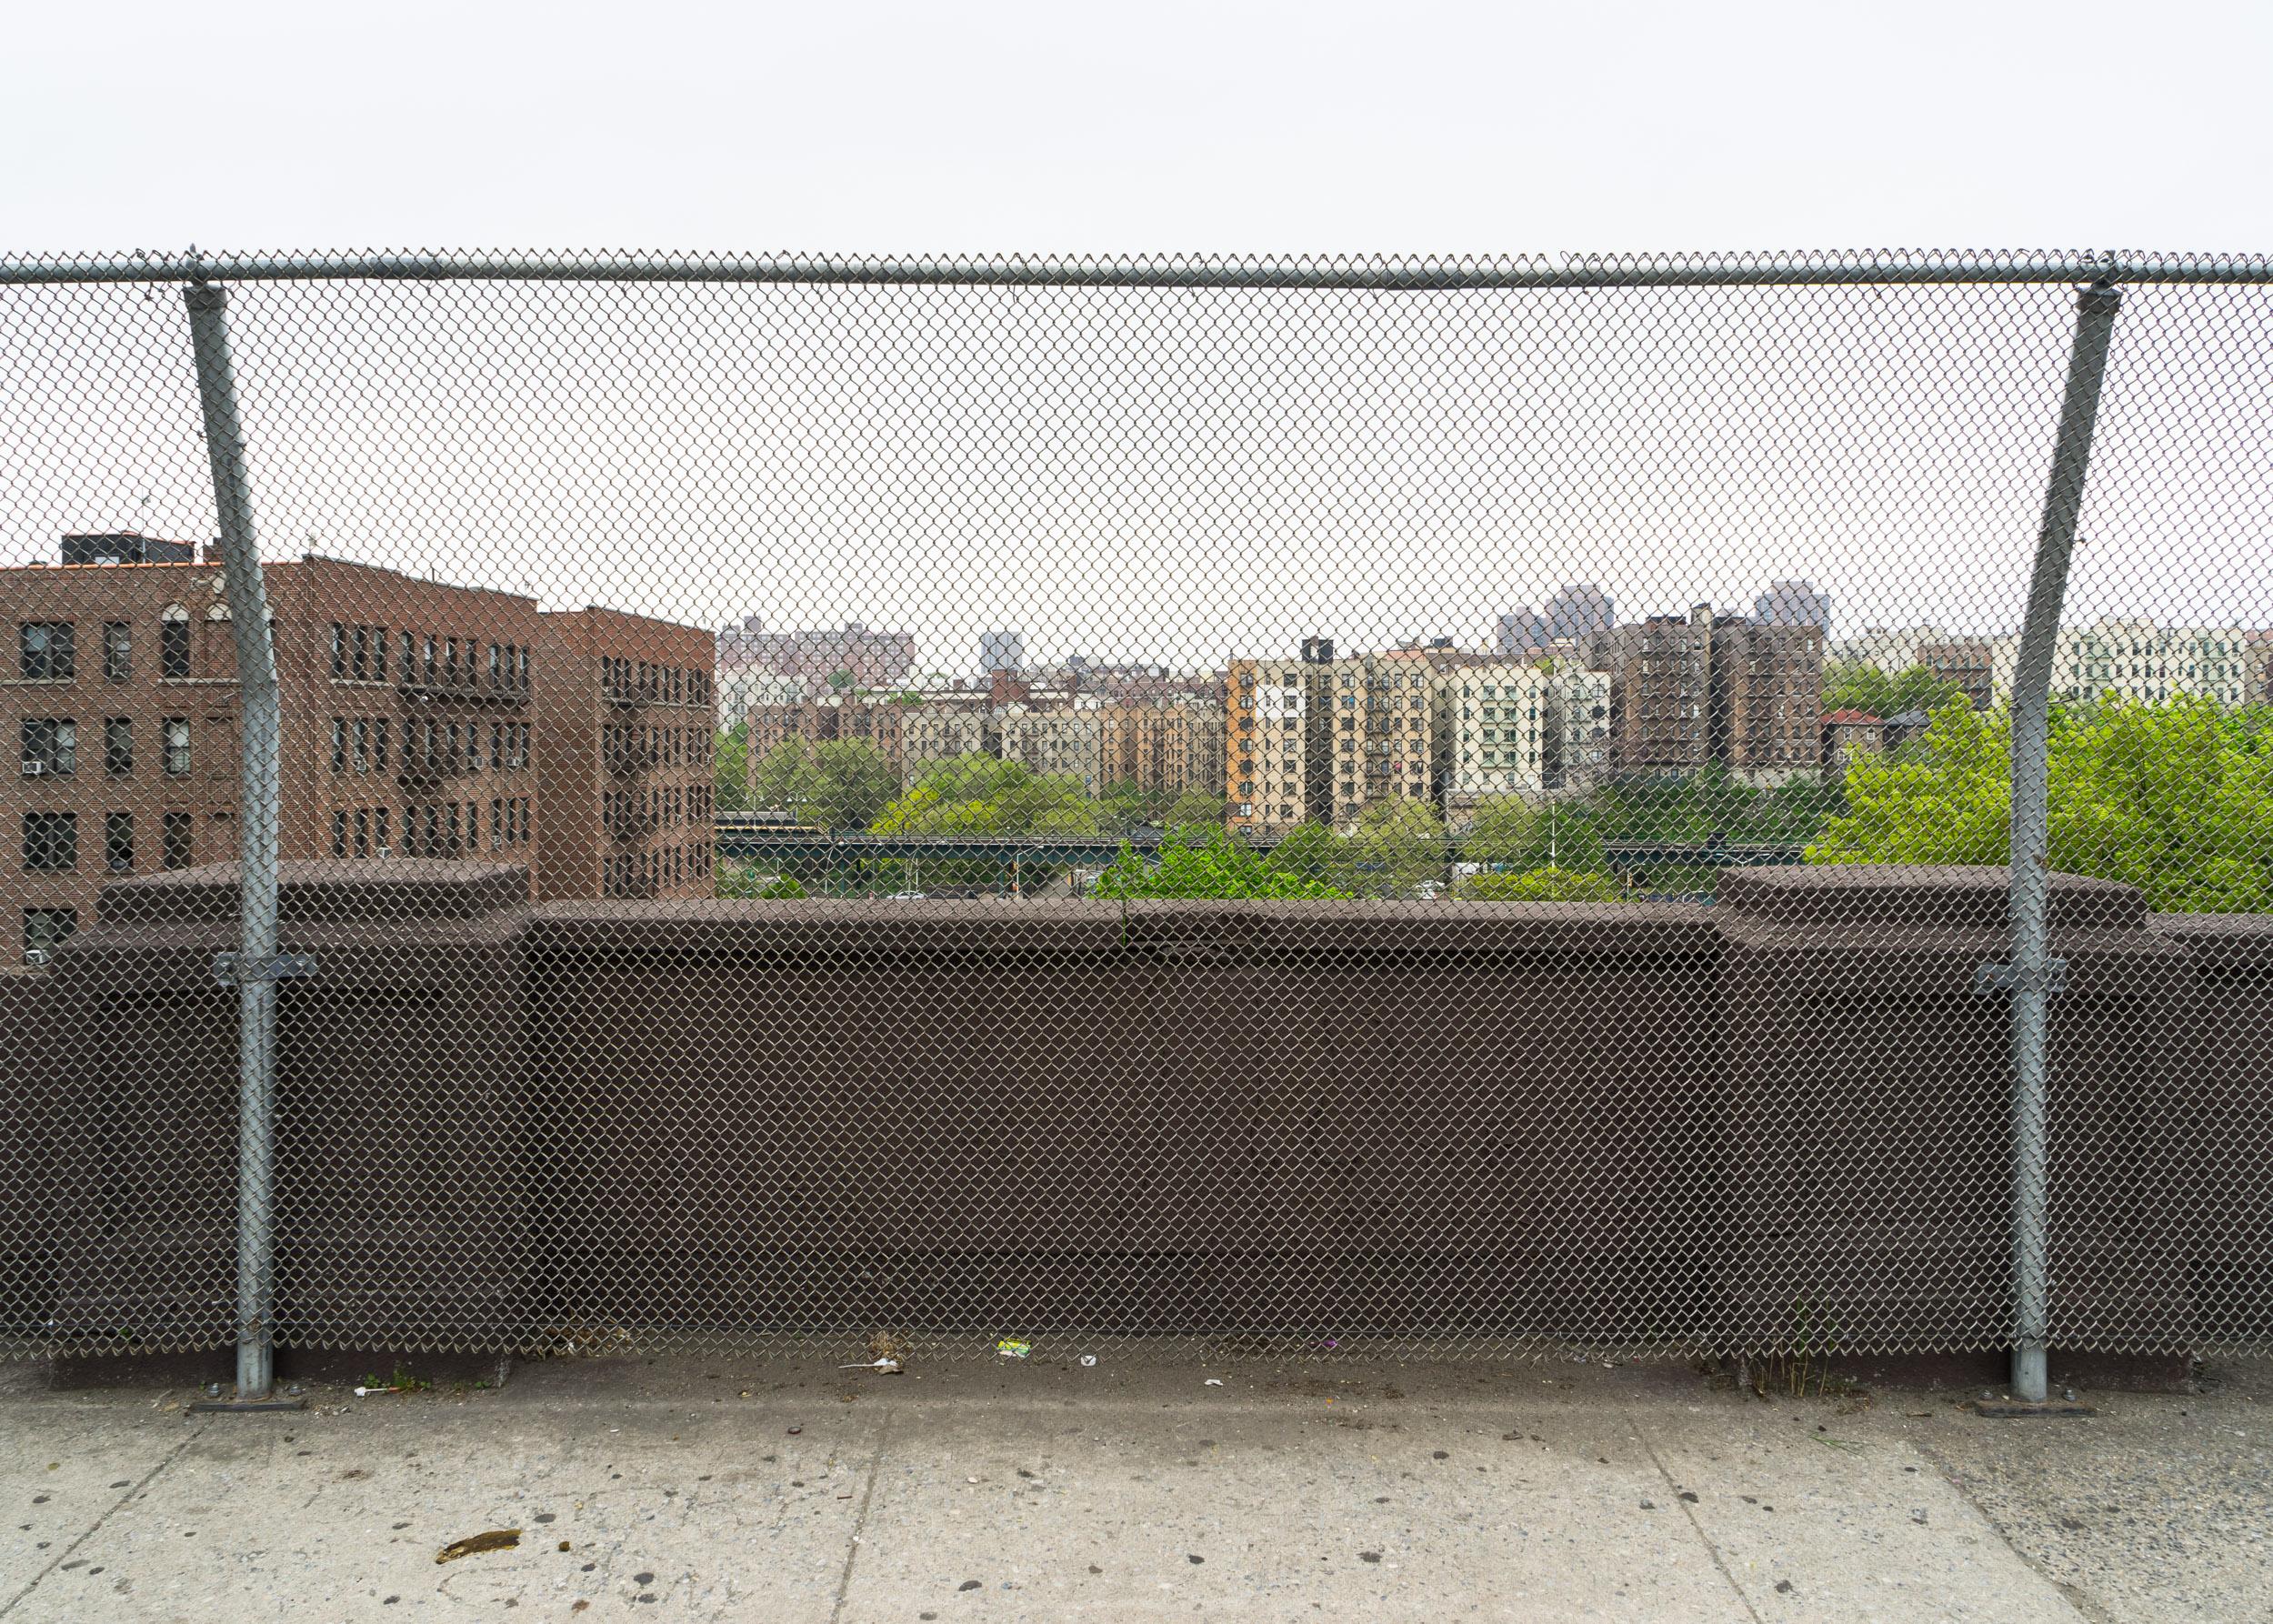 Bronx_kg008.jpg